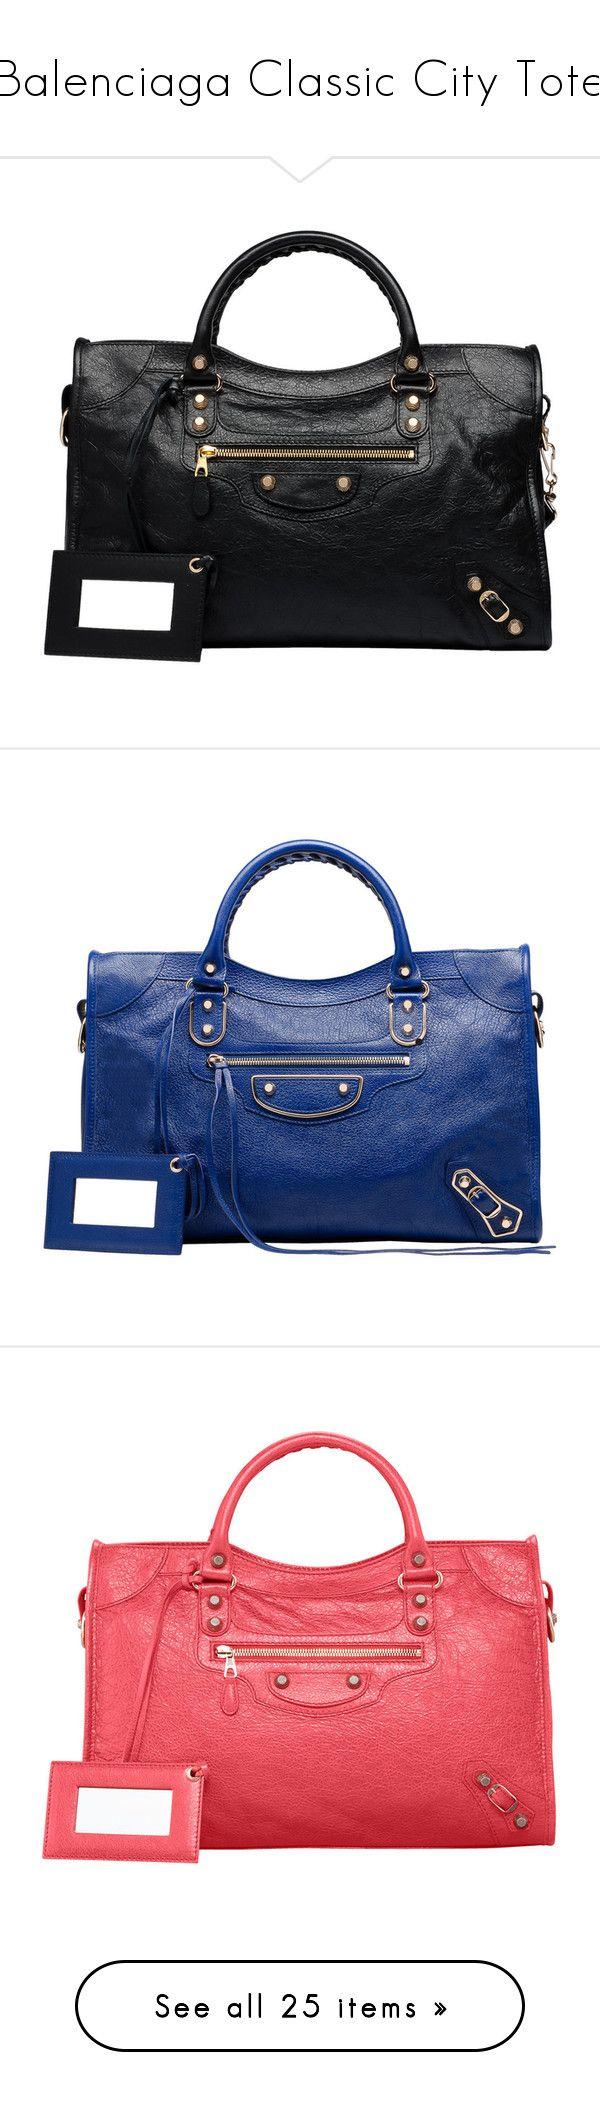 """Balenciaga Classic City Tote"" by euphemiasun97 ❤ liked on Polyvore featuring bags, handbags, balenciaga, bolsos, purses, handbag purse, purse shoulder bag, balenciaga purse, gold handbags and blue handbags"